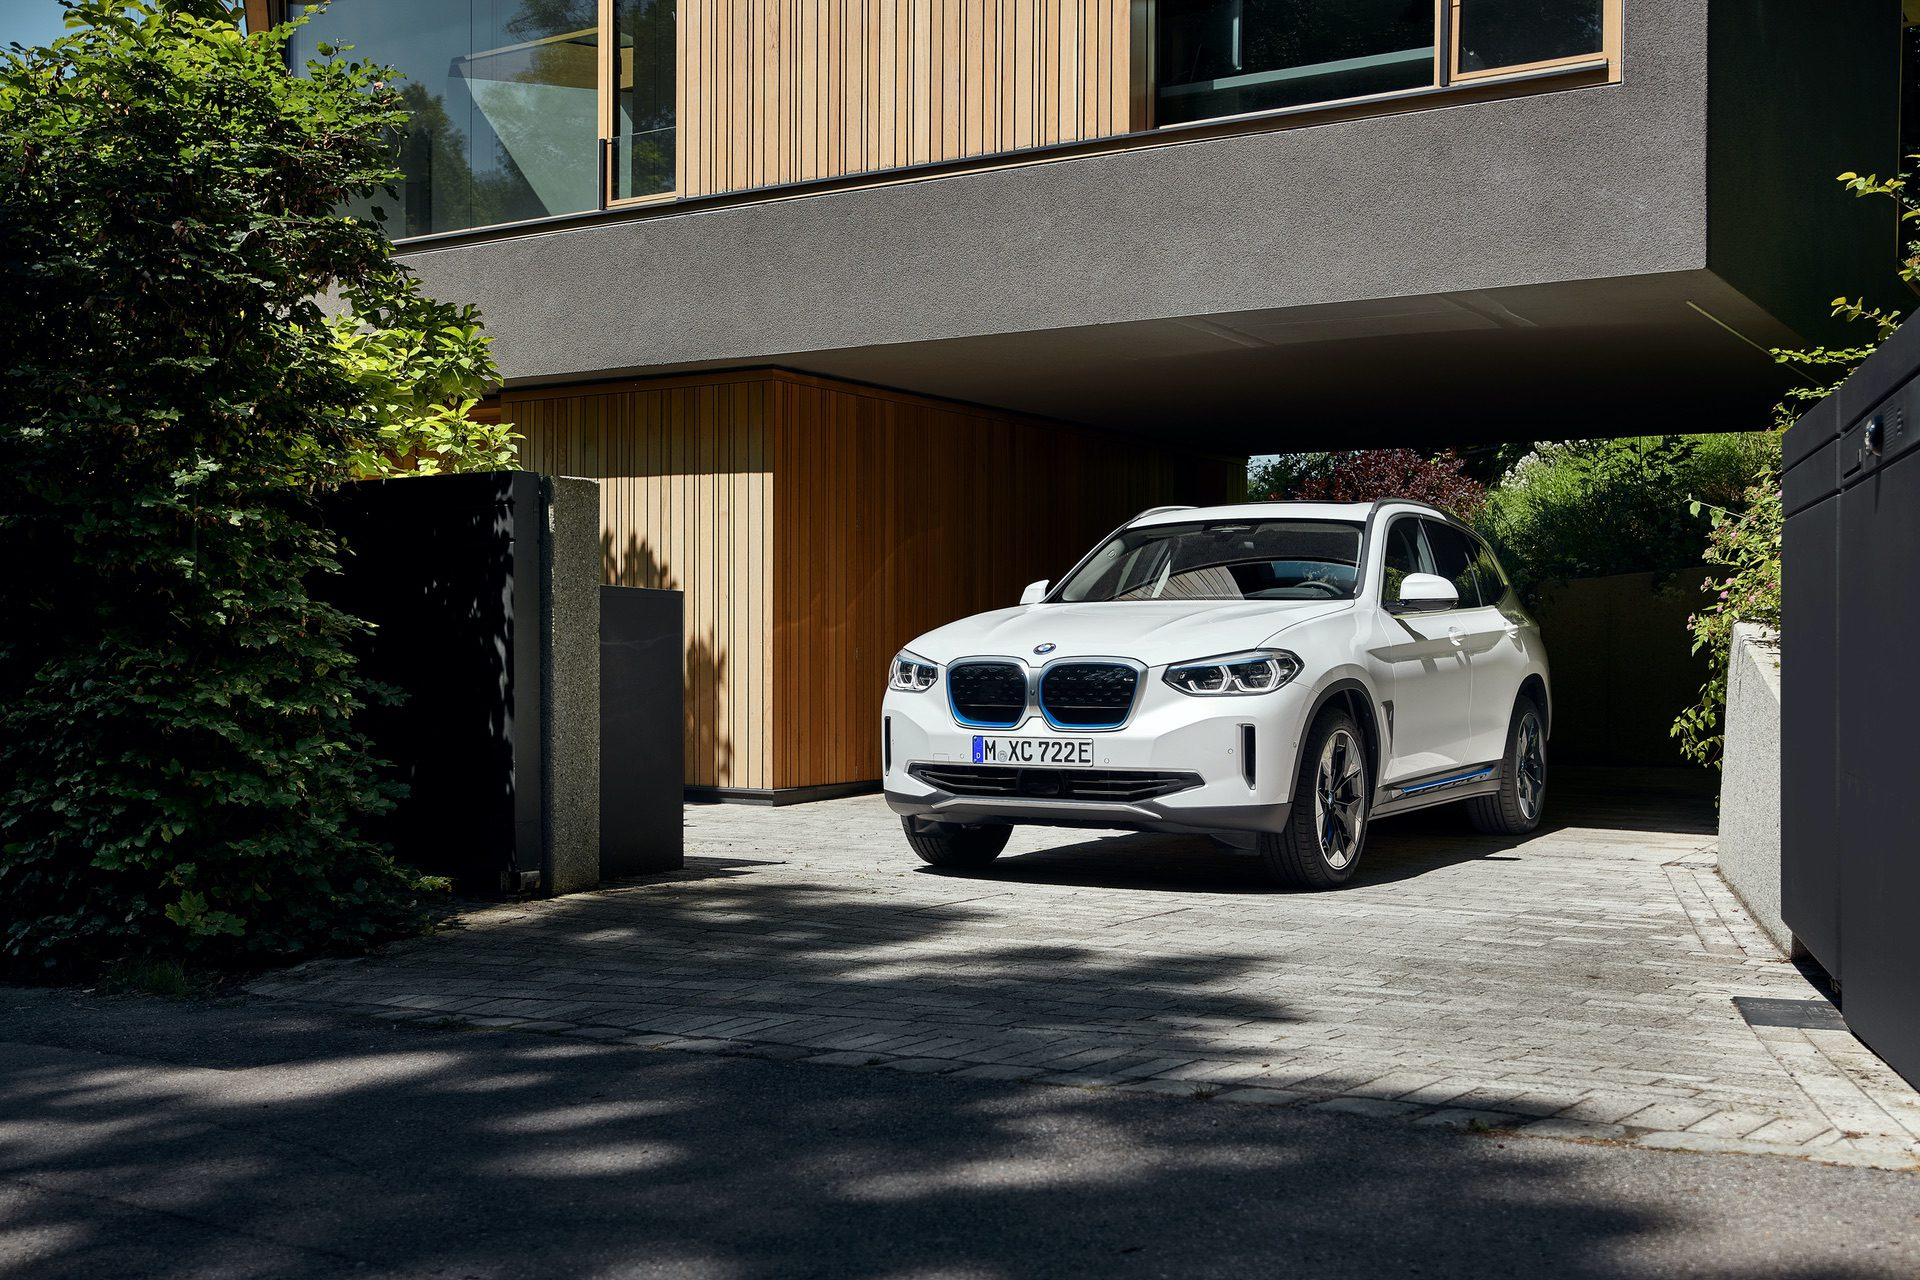 2020 BMW iX3 electric SUV 15